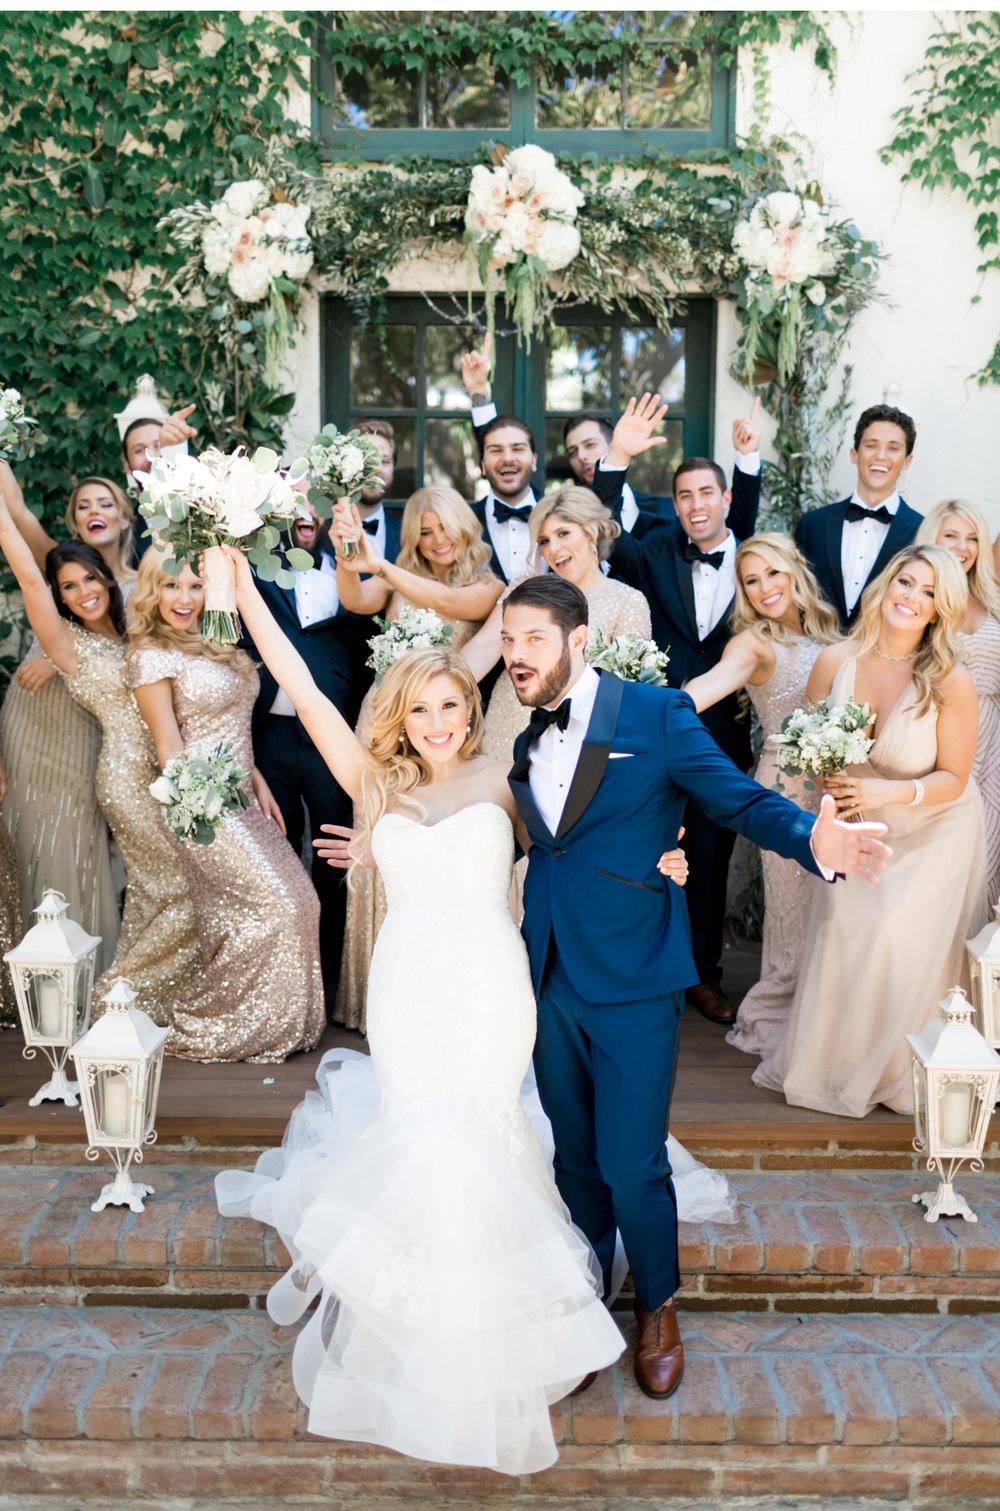 San-Juan-Capistrano-Wedding-Style-Me-Pretty-Natalie-Schutt-Photography_12.jpg